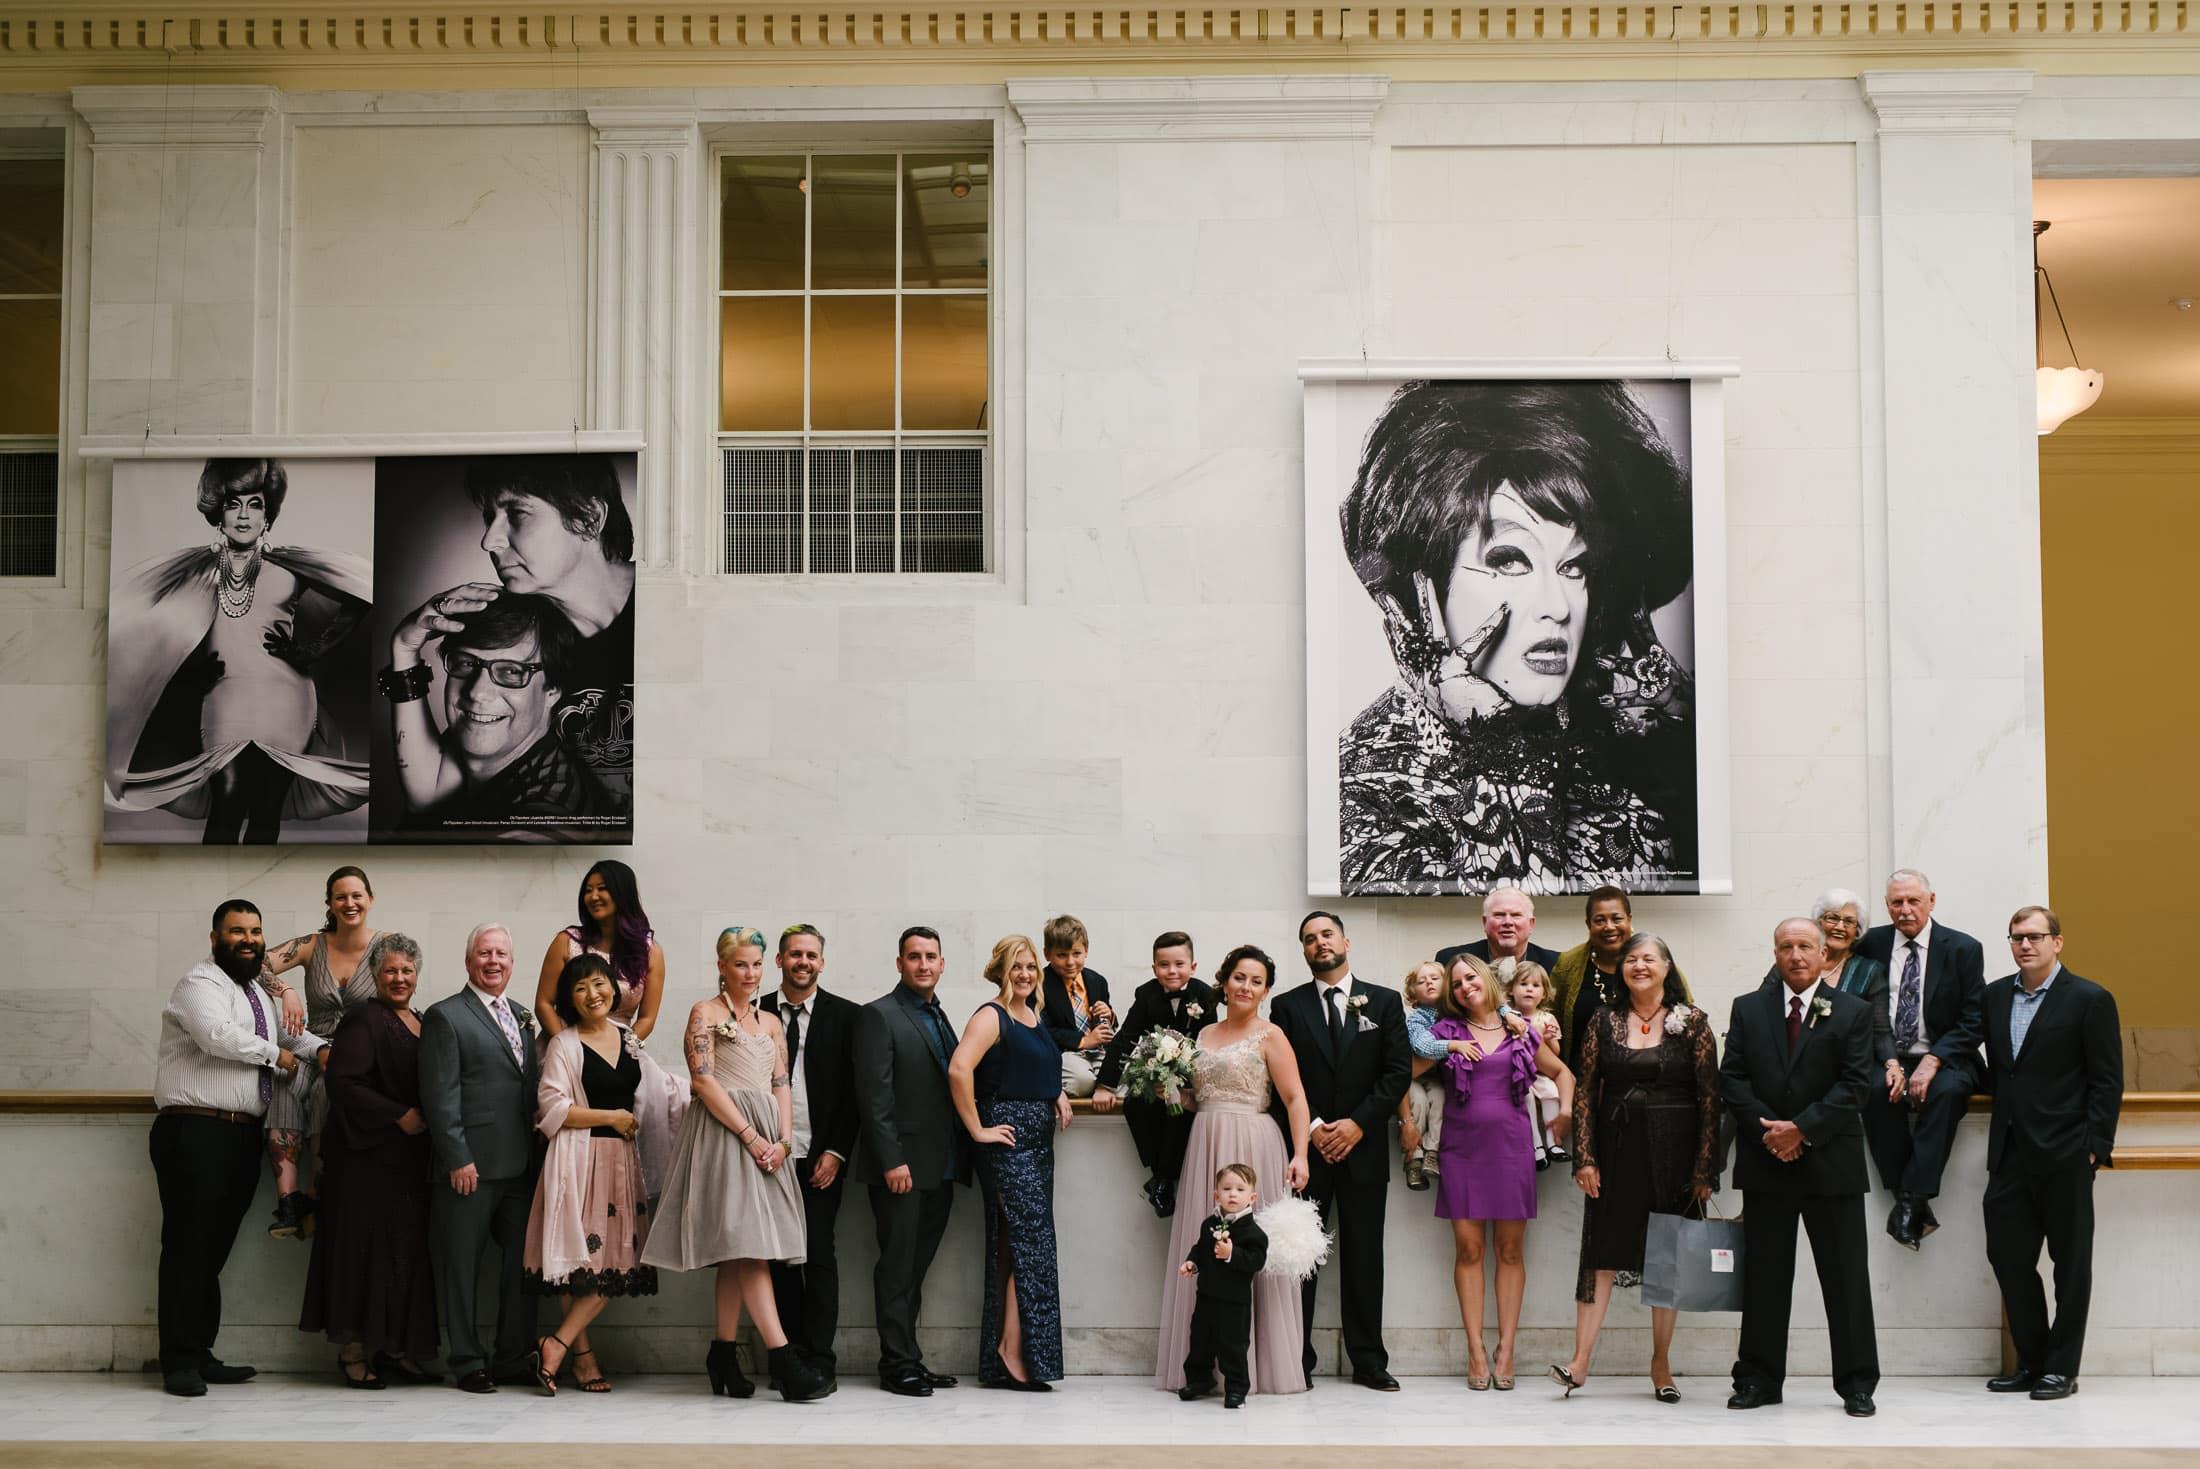 wedding attendants group portrait at san francisco city hall